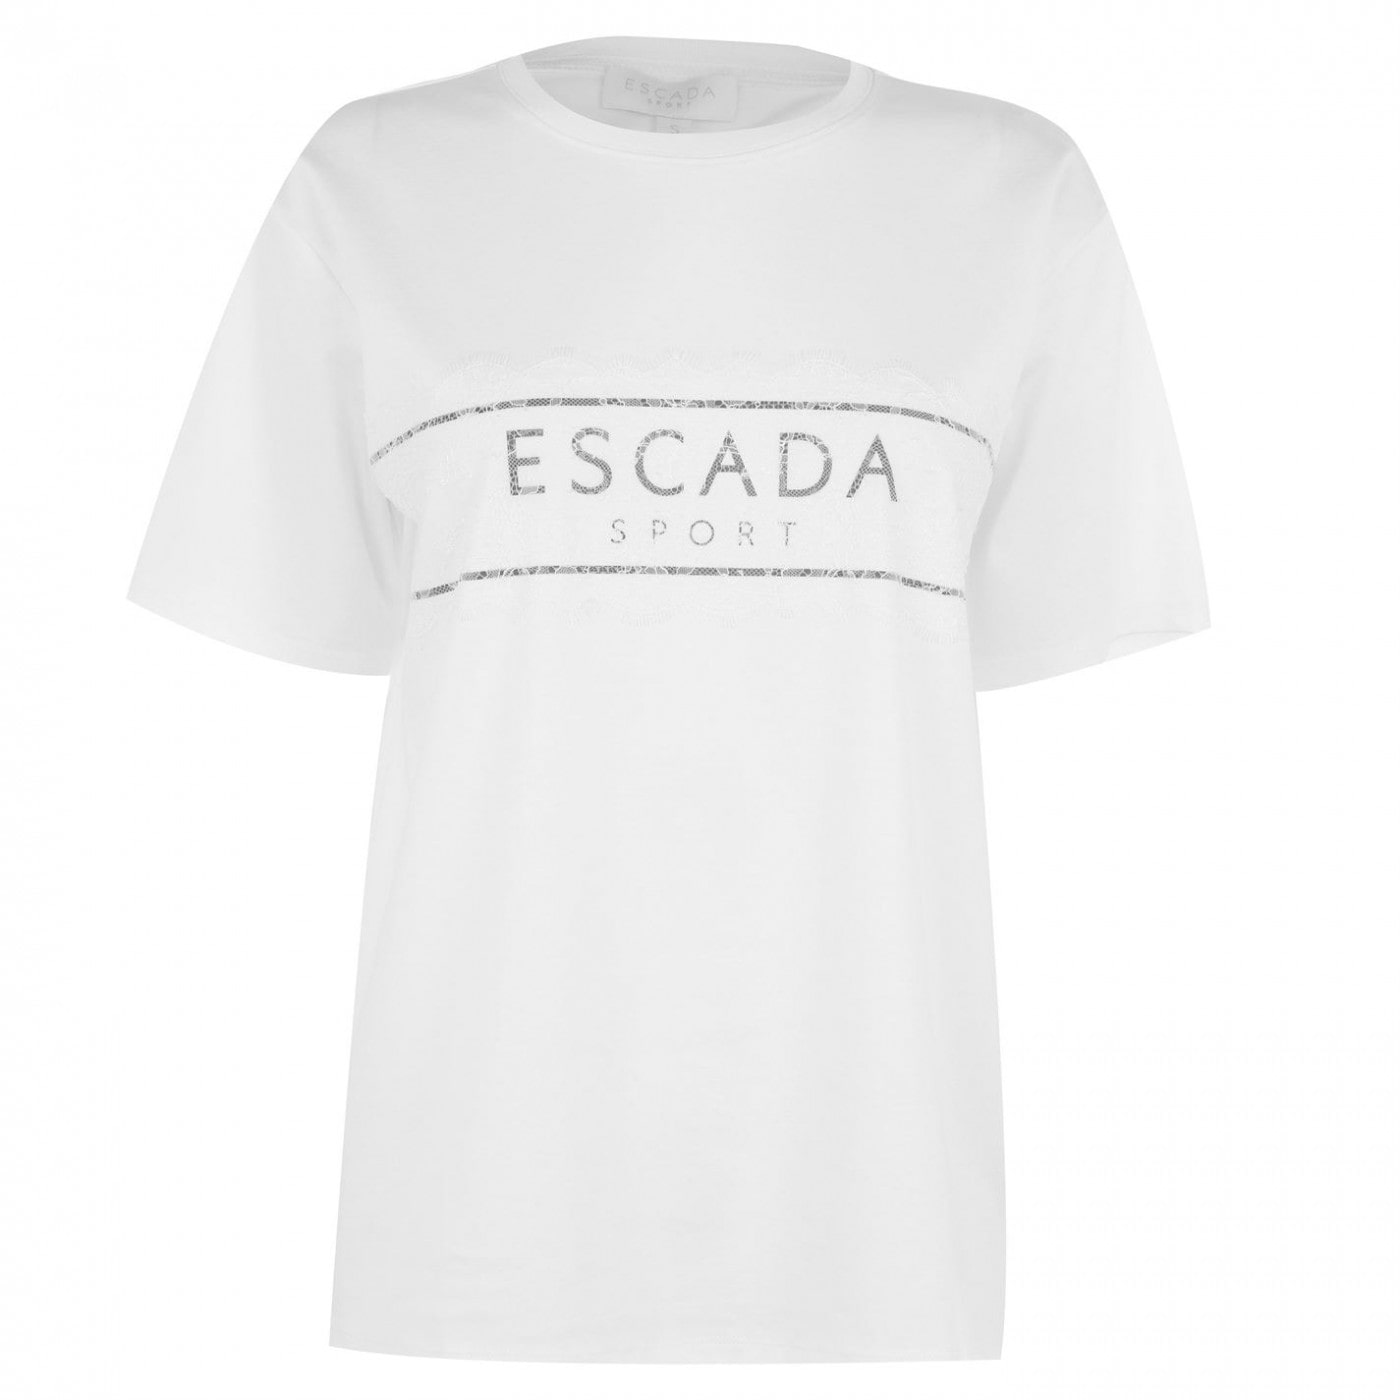 Escada Ediore T Shirt